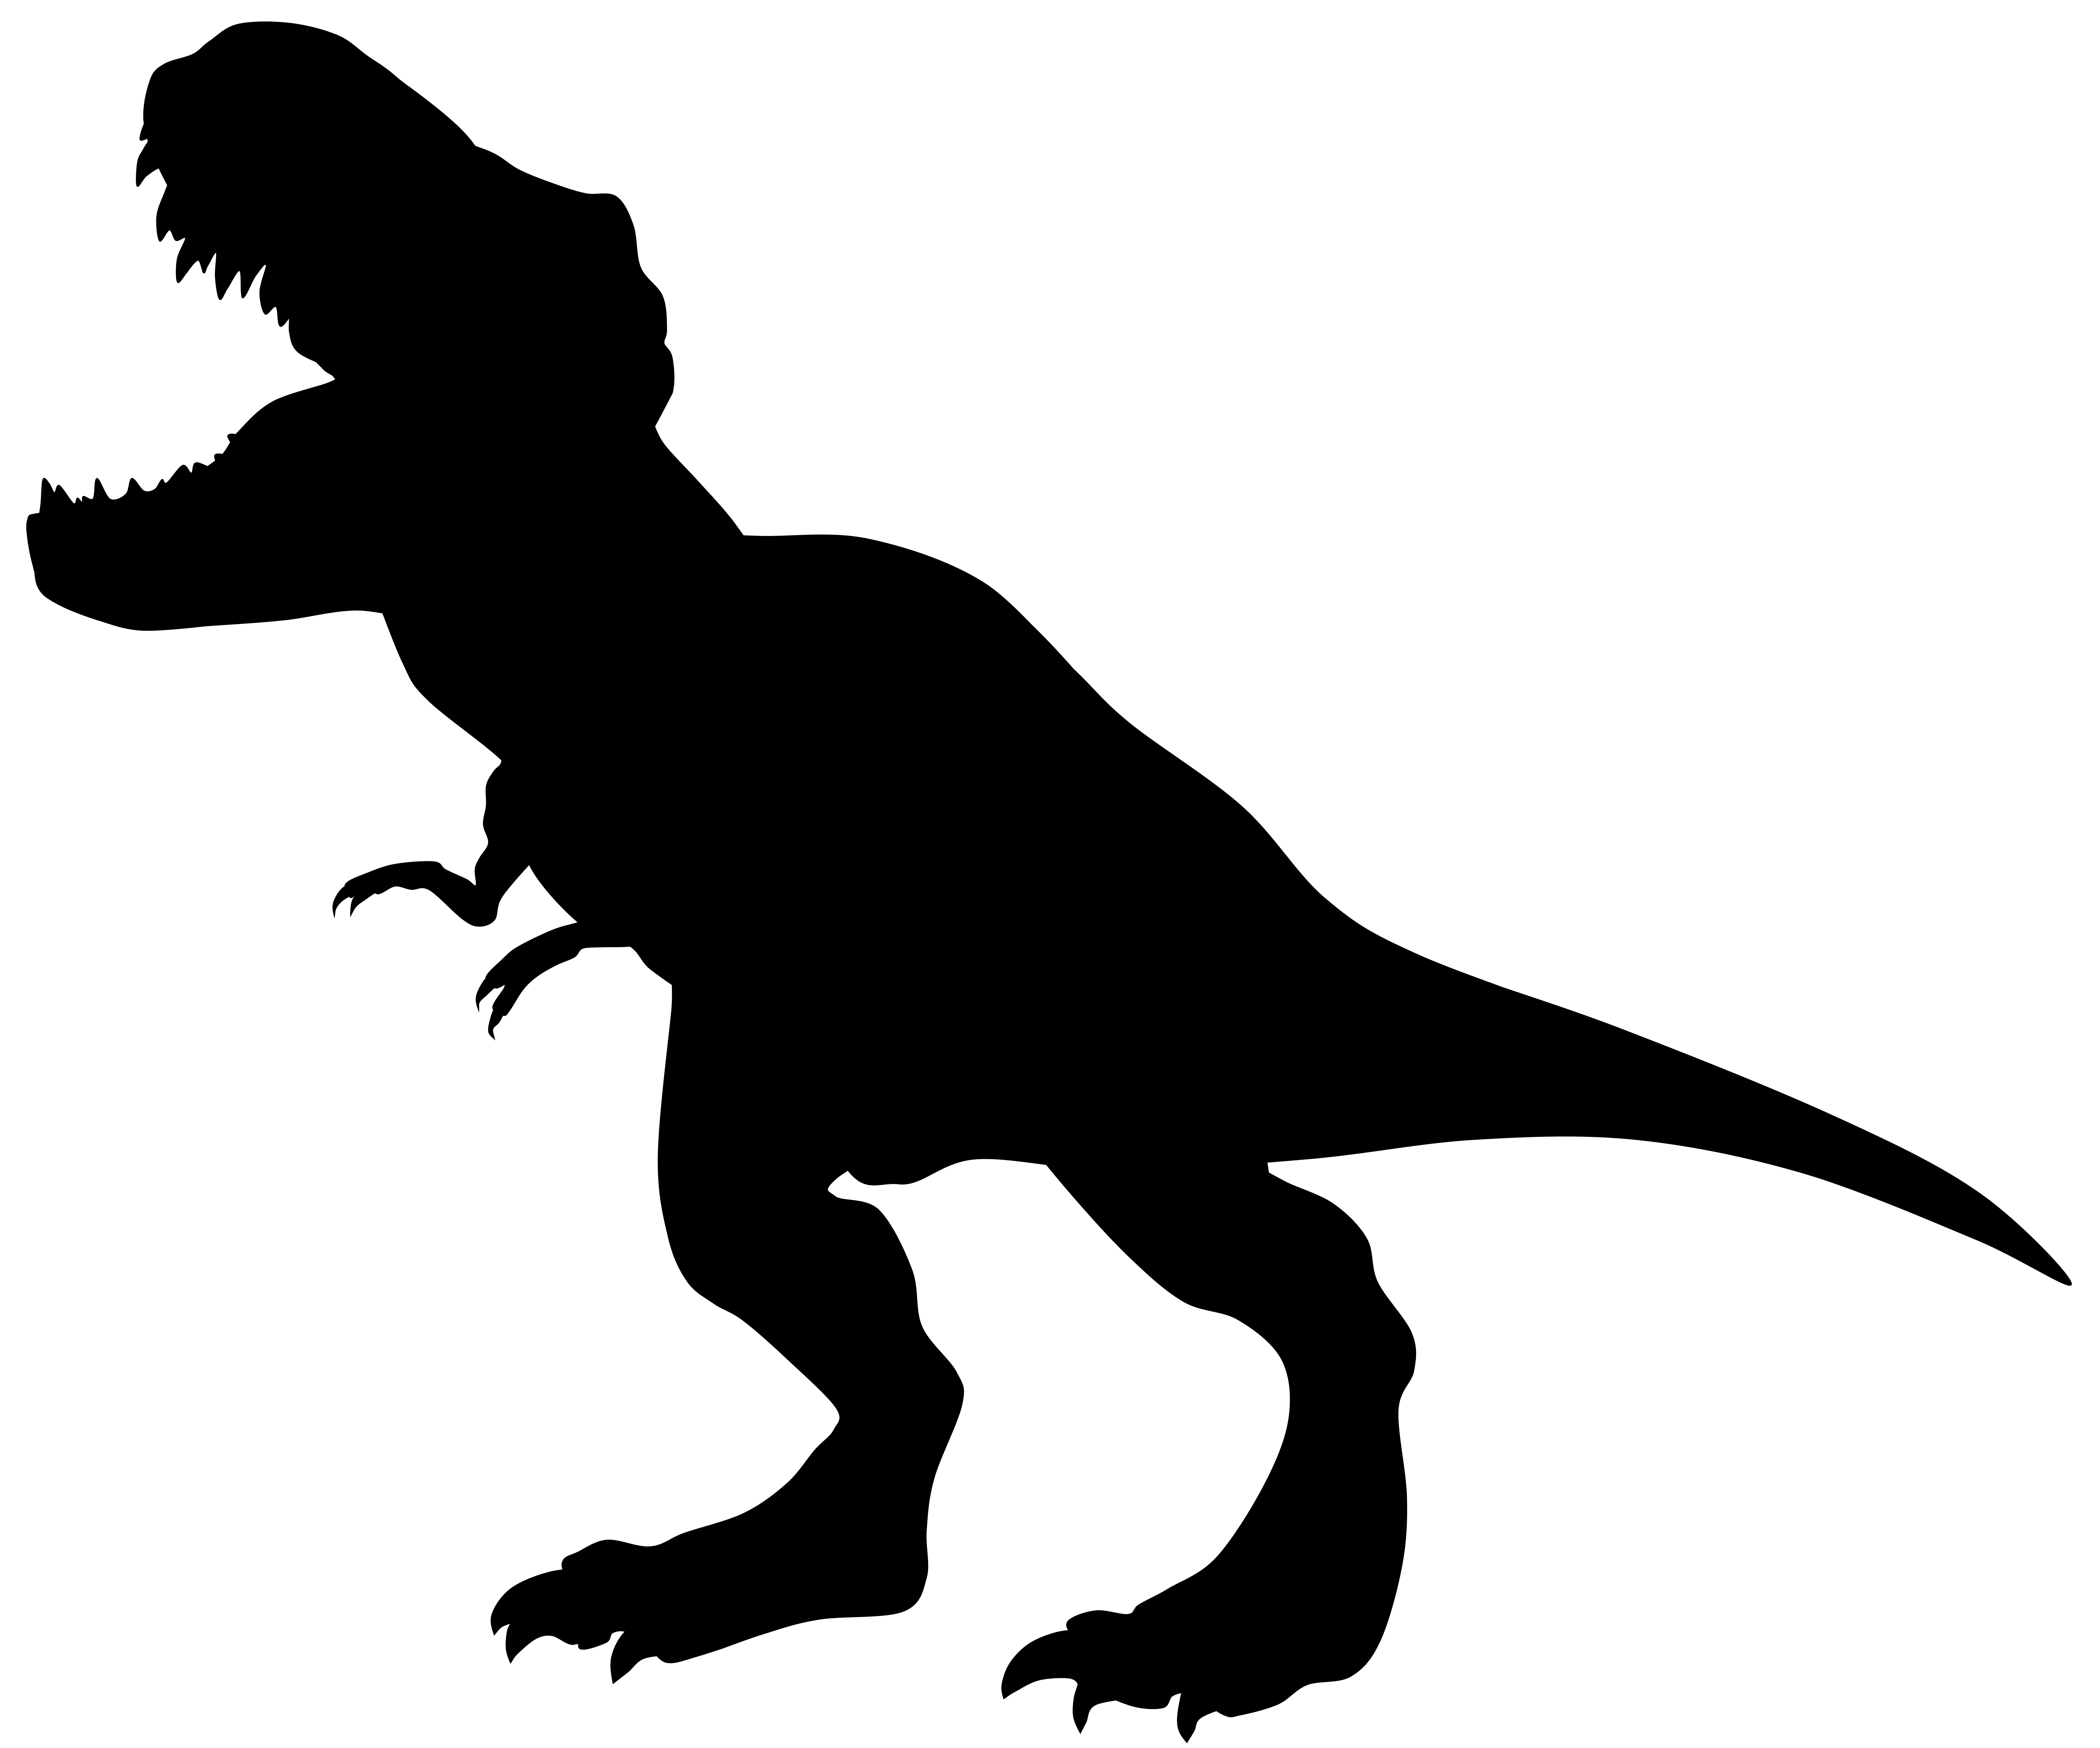 8000x6660 Dinosaur Silhouette Clipart Clipart Download Vinyl